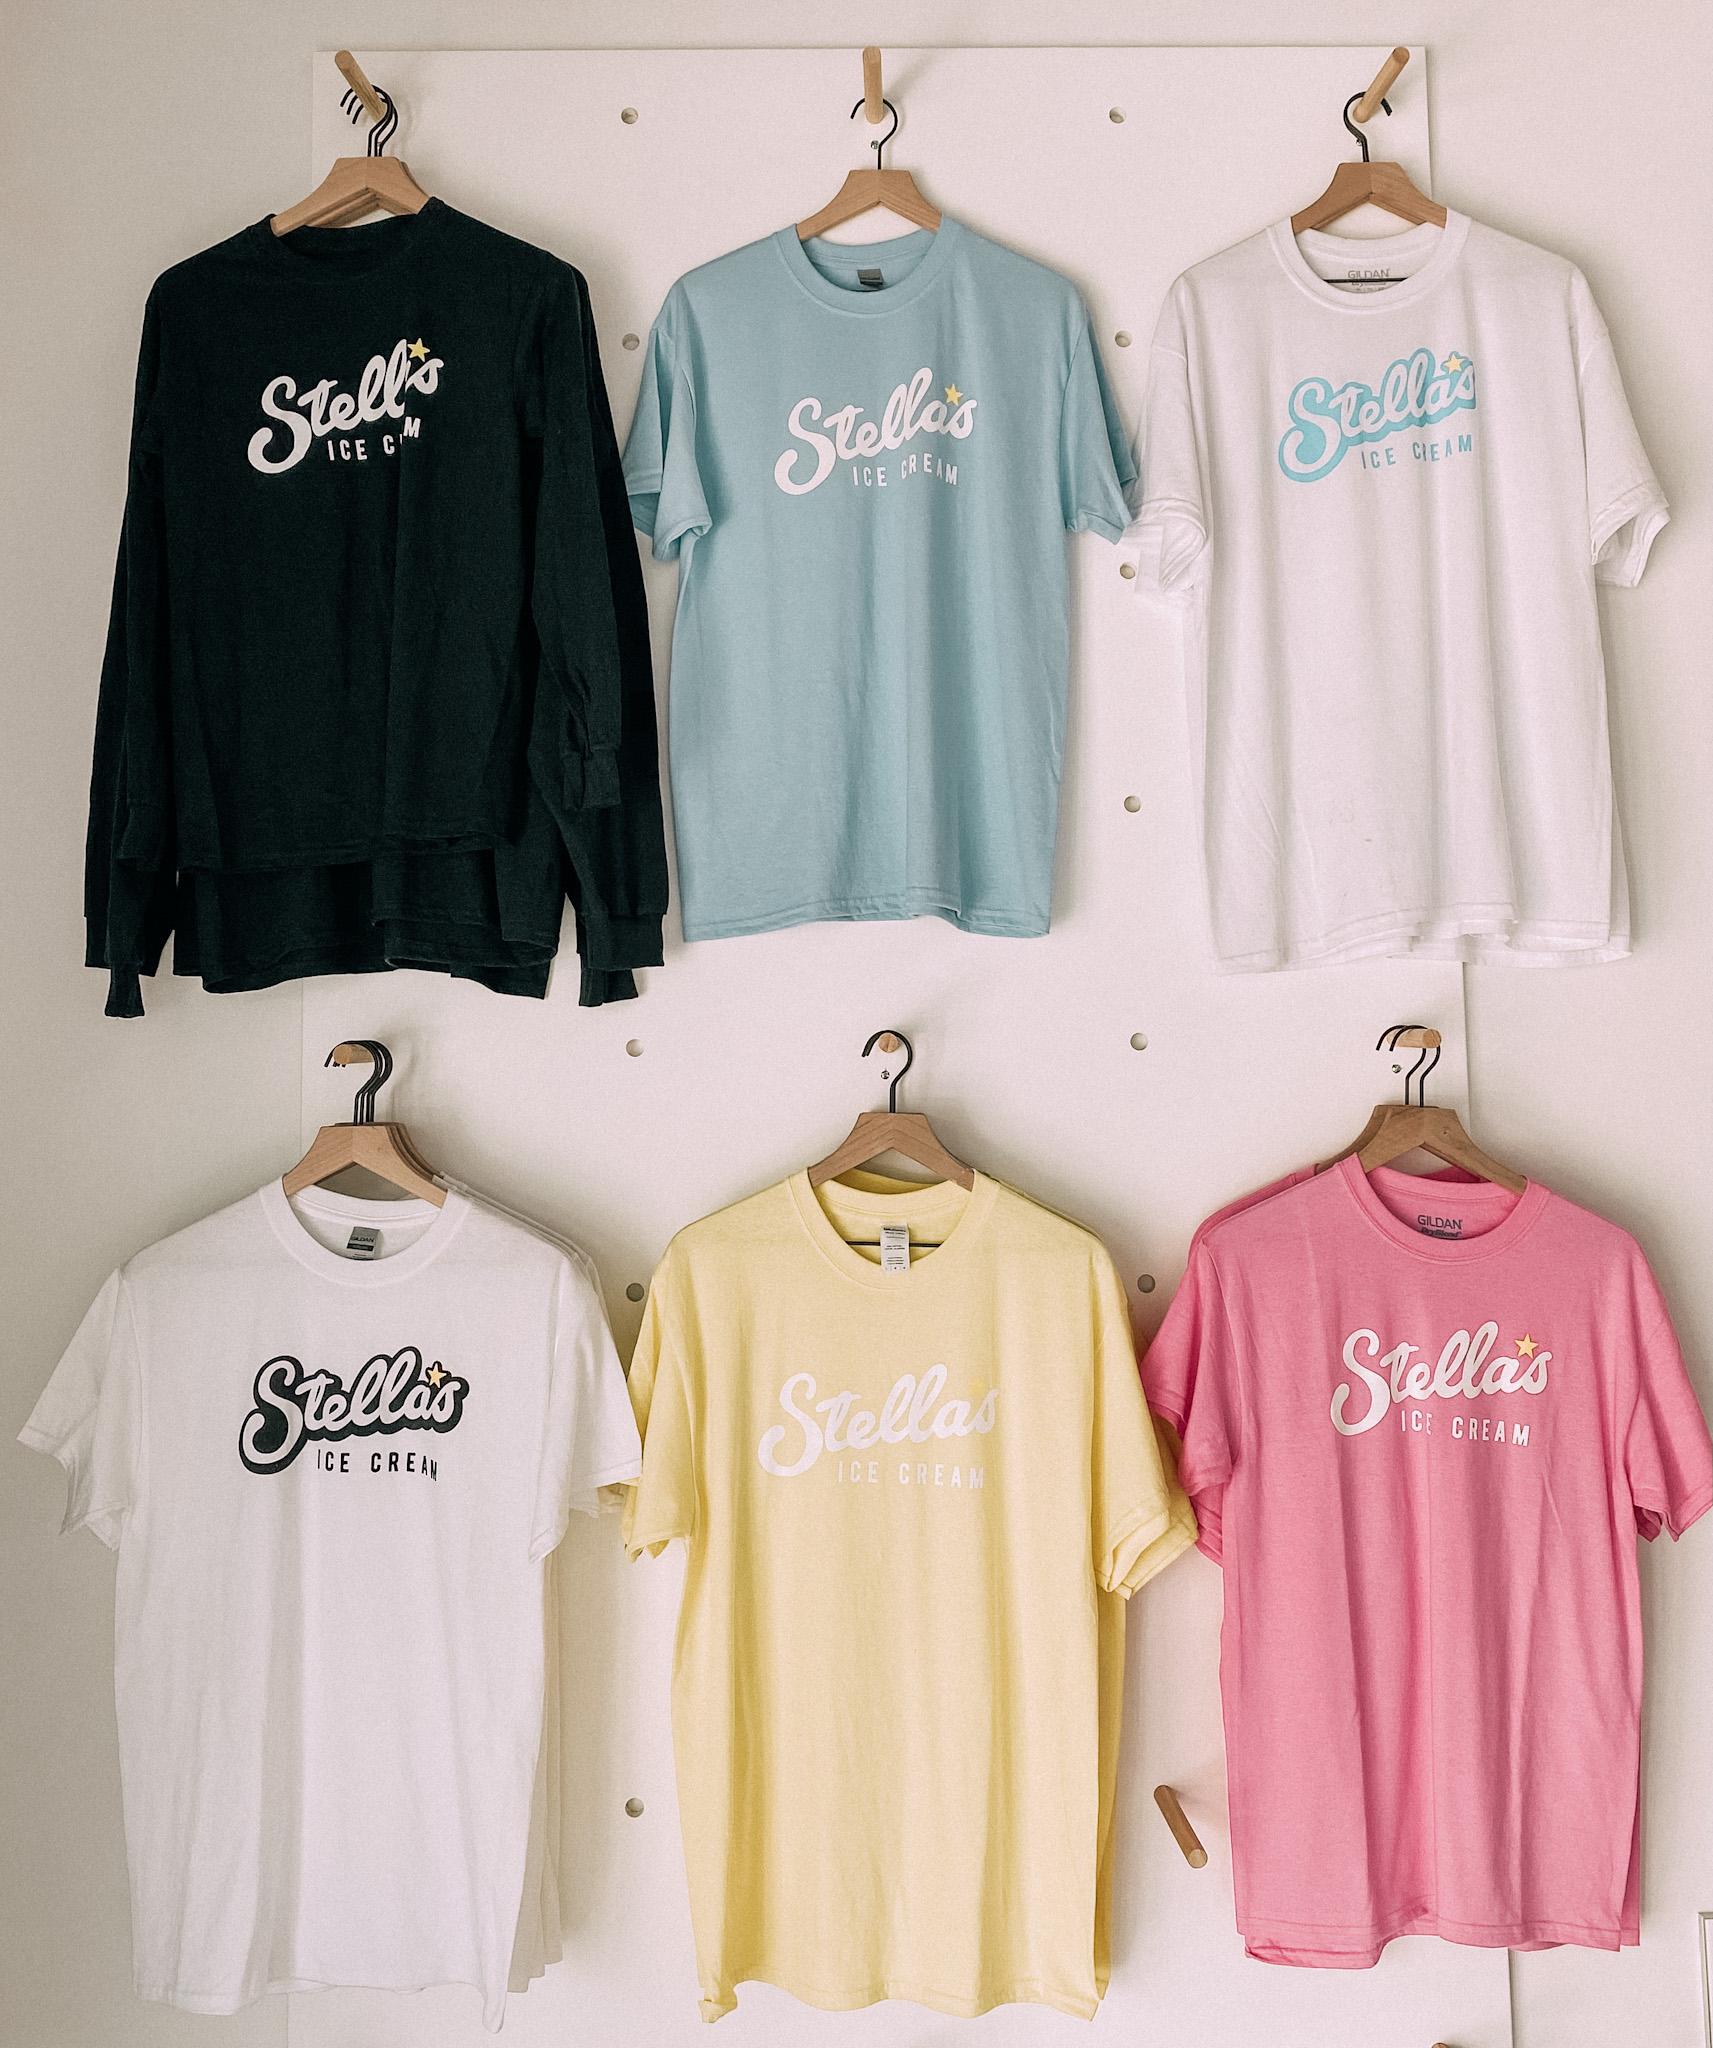 Eagle Shirts